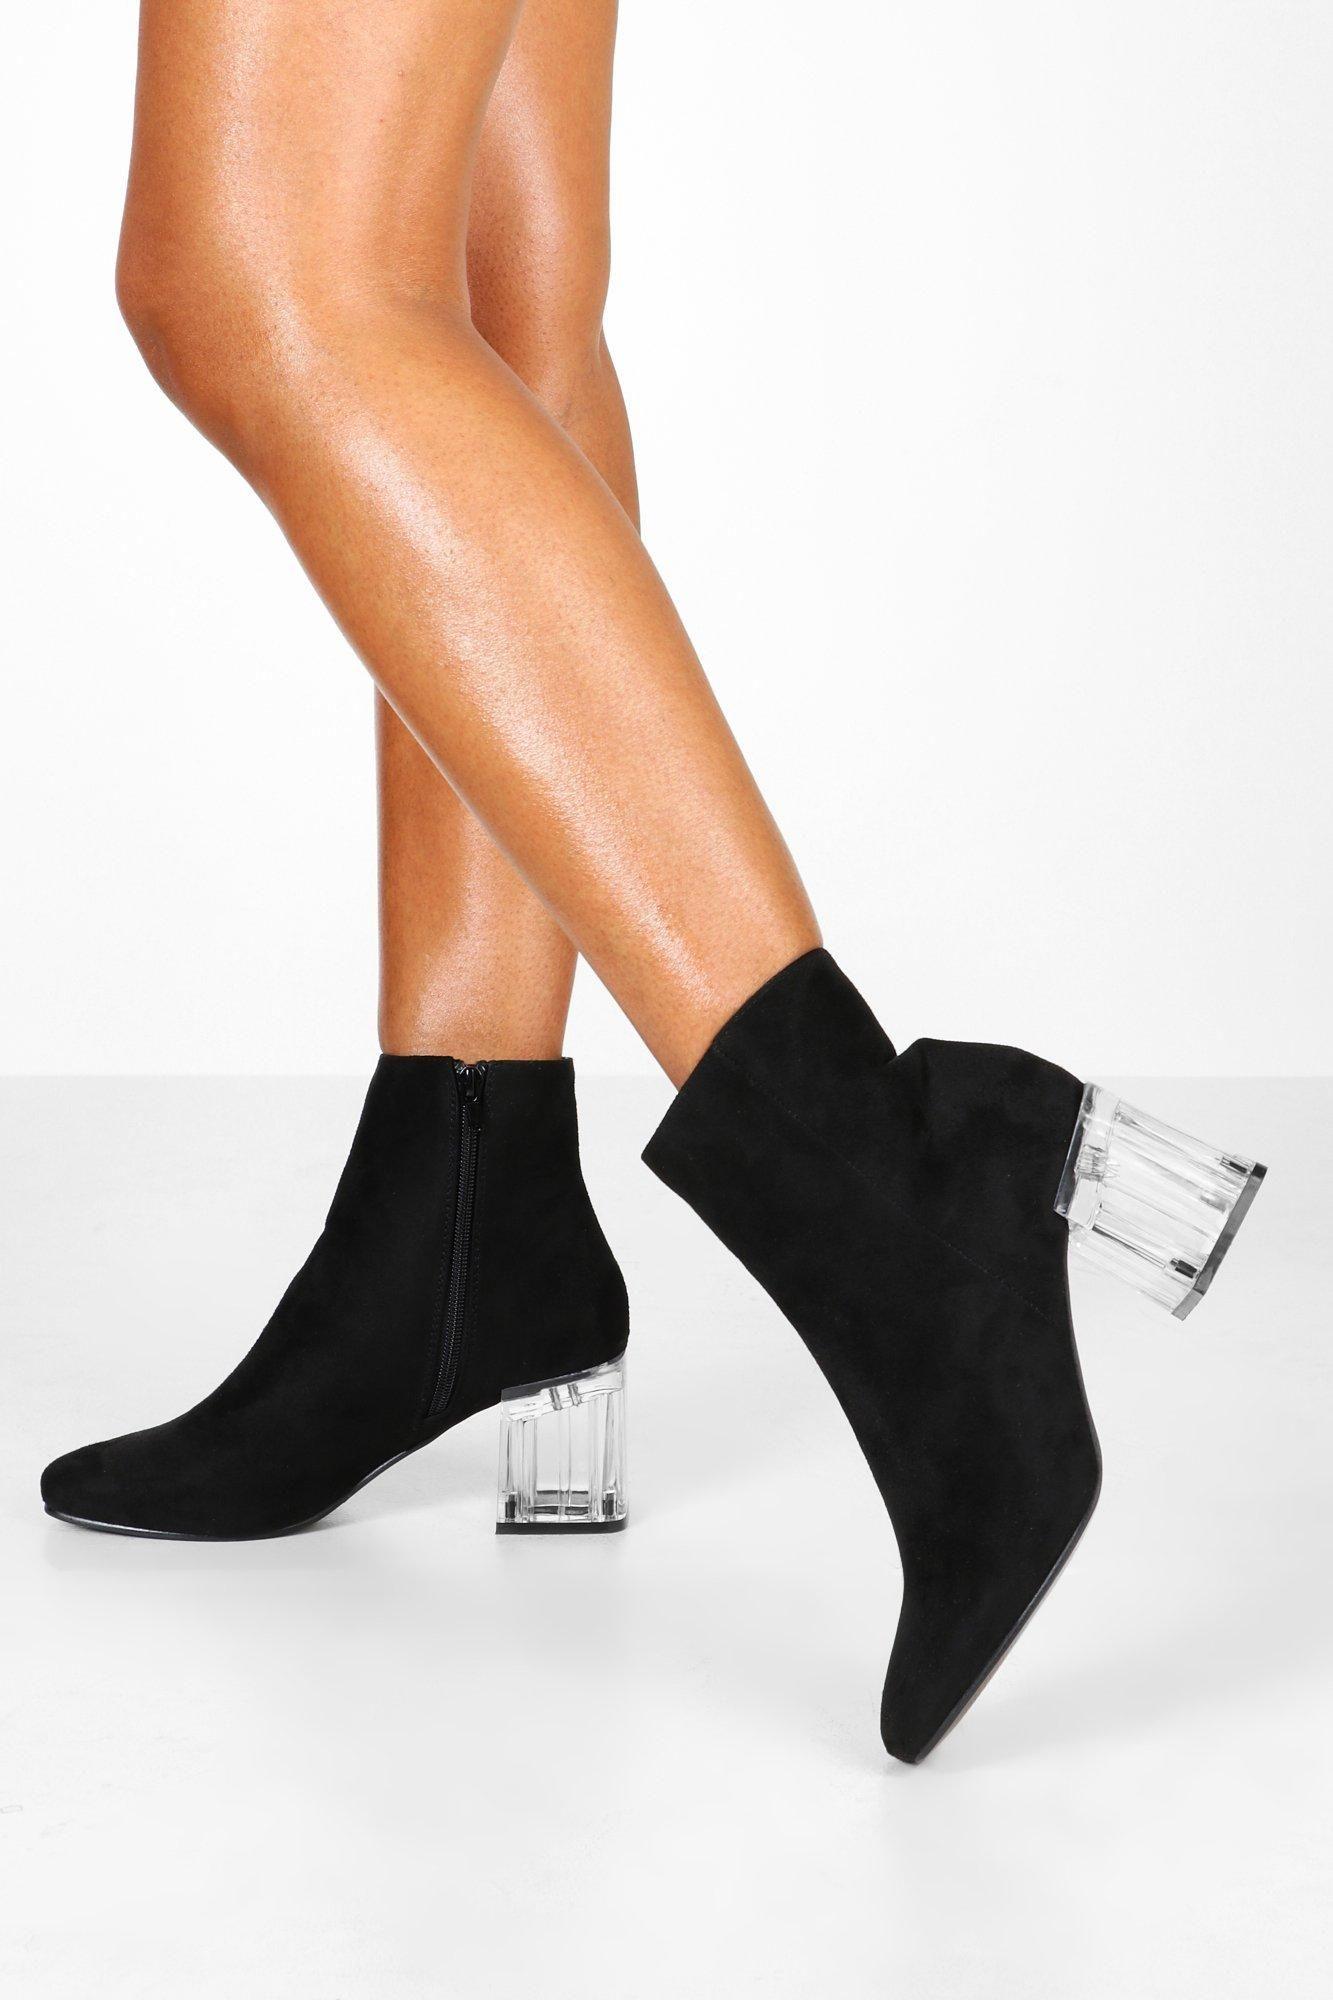 Low block heel shoes, Boots, Shoe boots